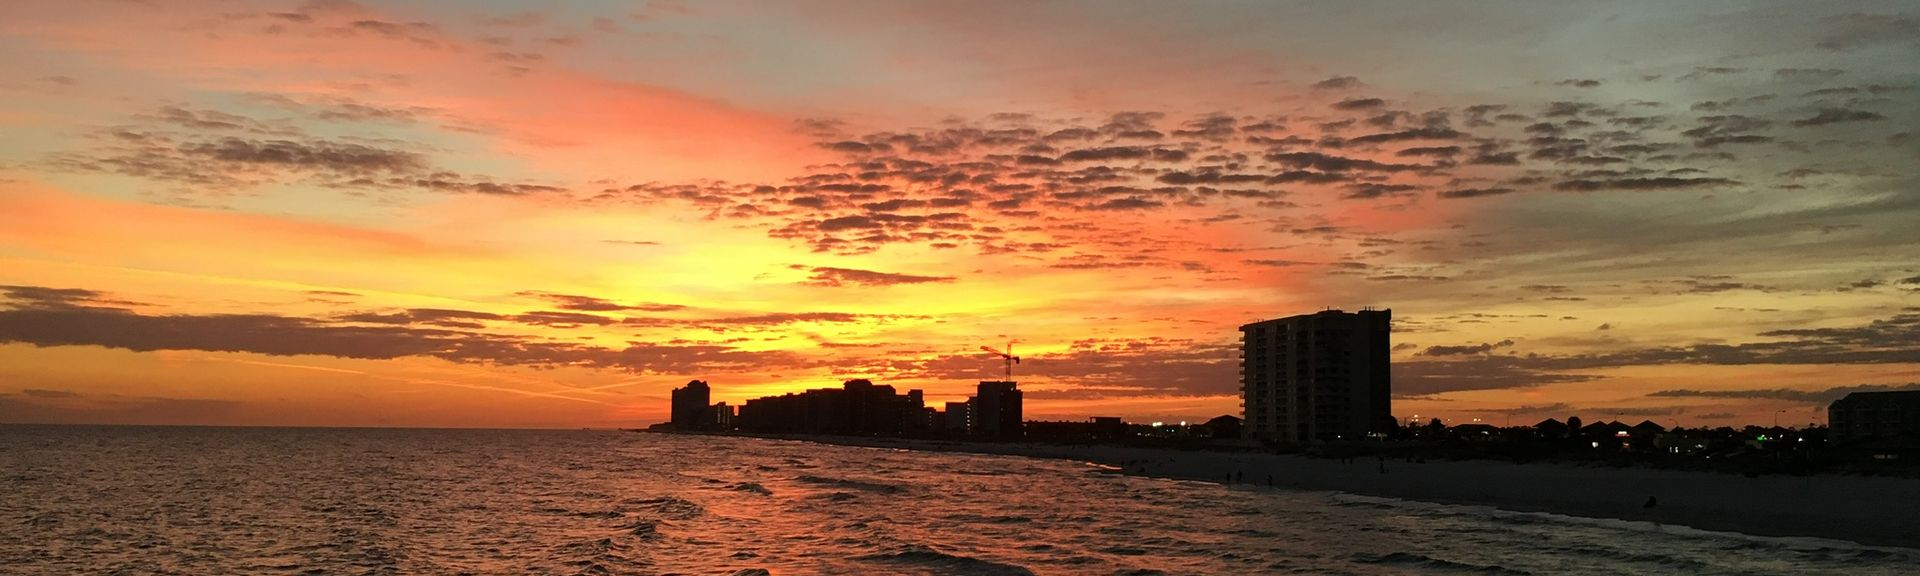 Four Seasons, Orange Beach, AL, USA